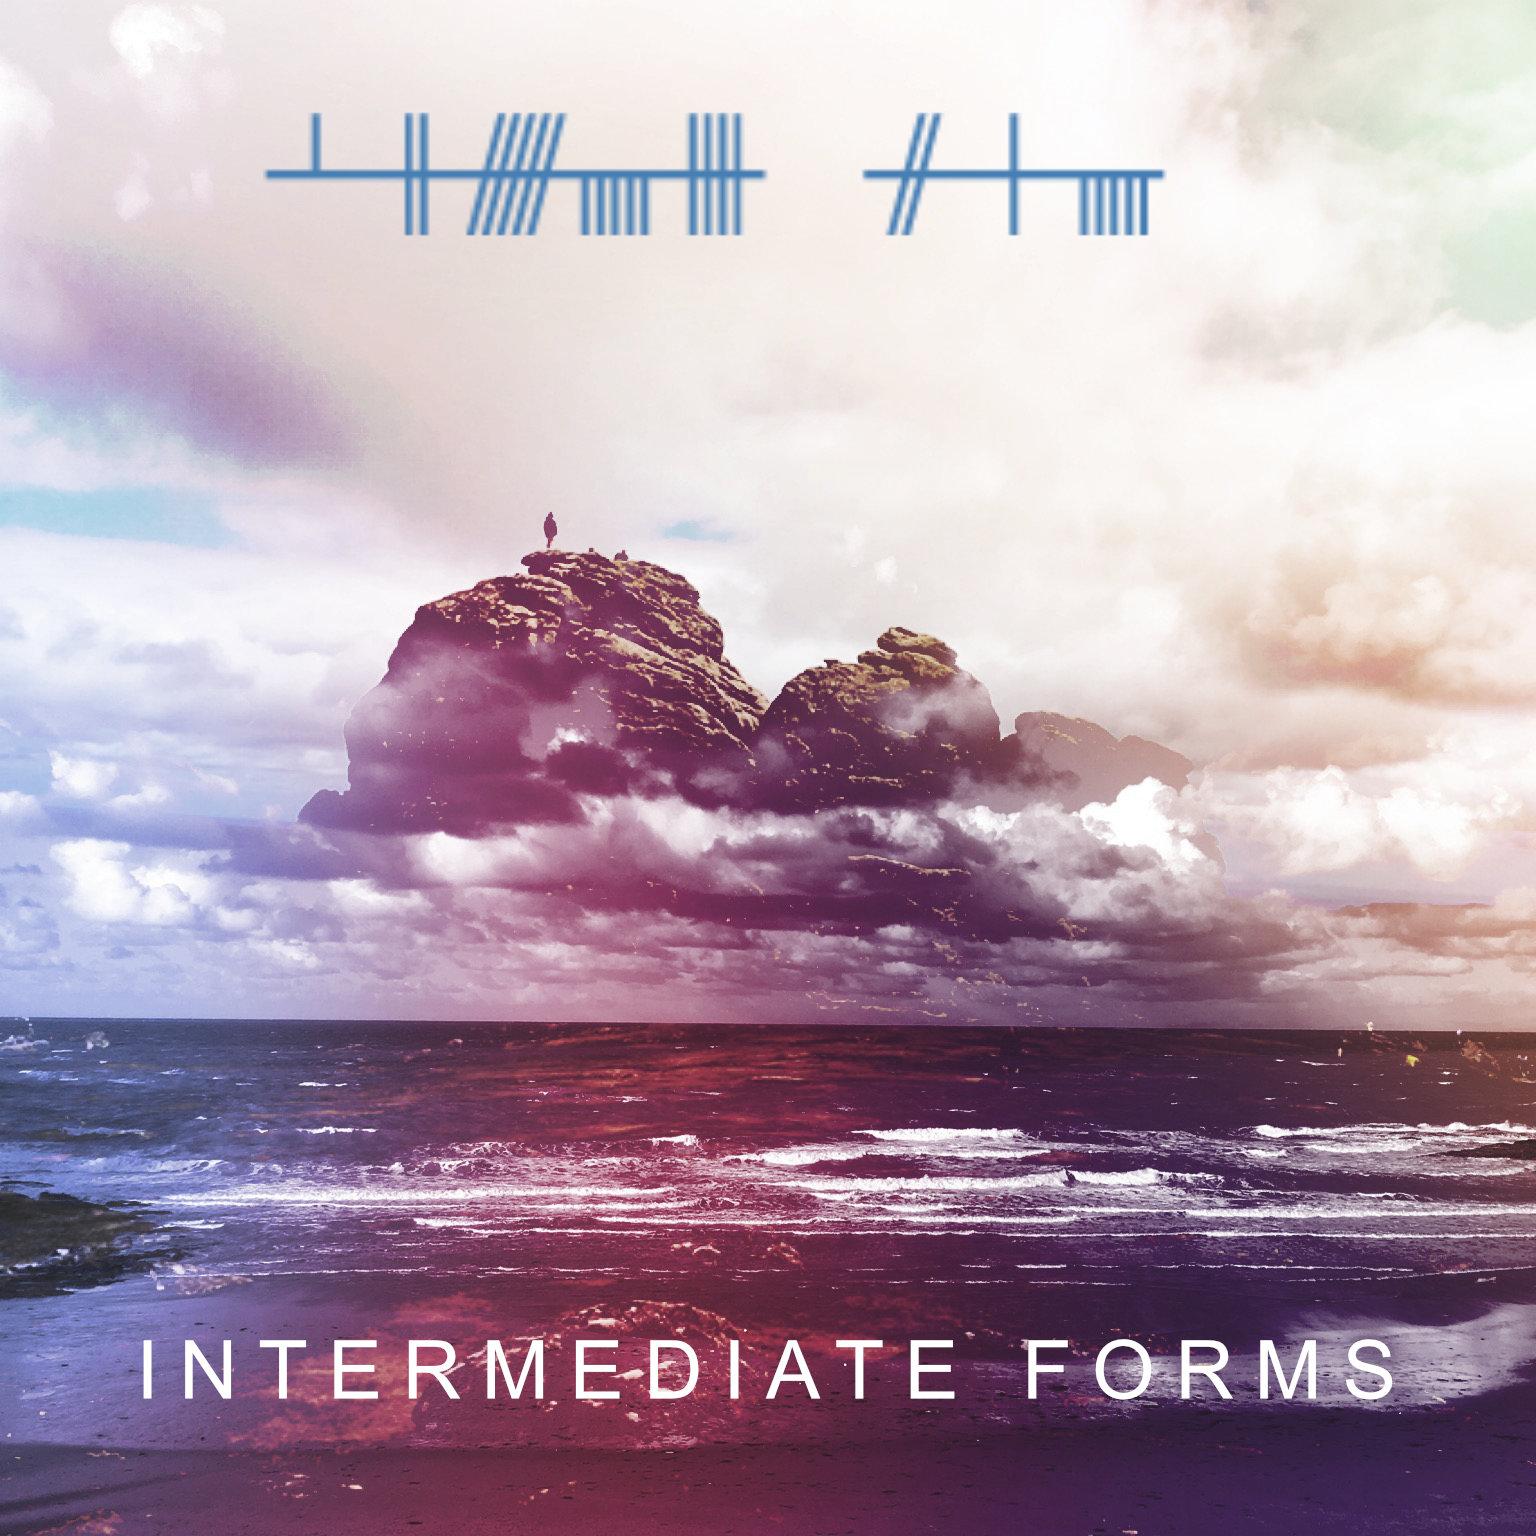 horse gas intermediate forms album